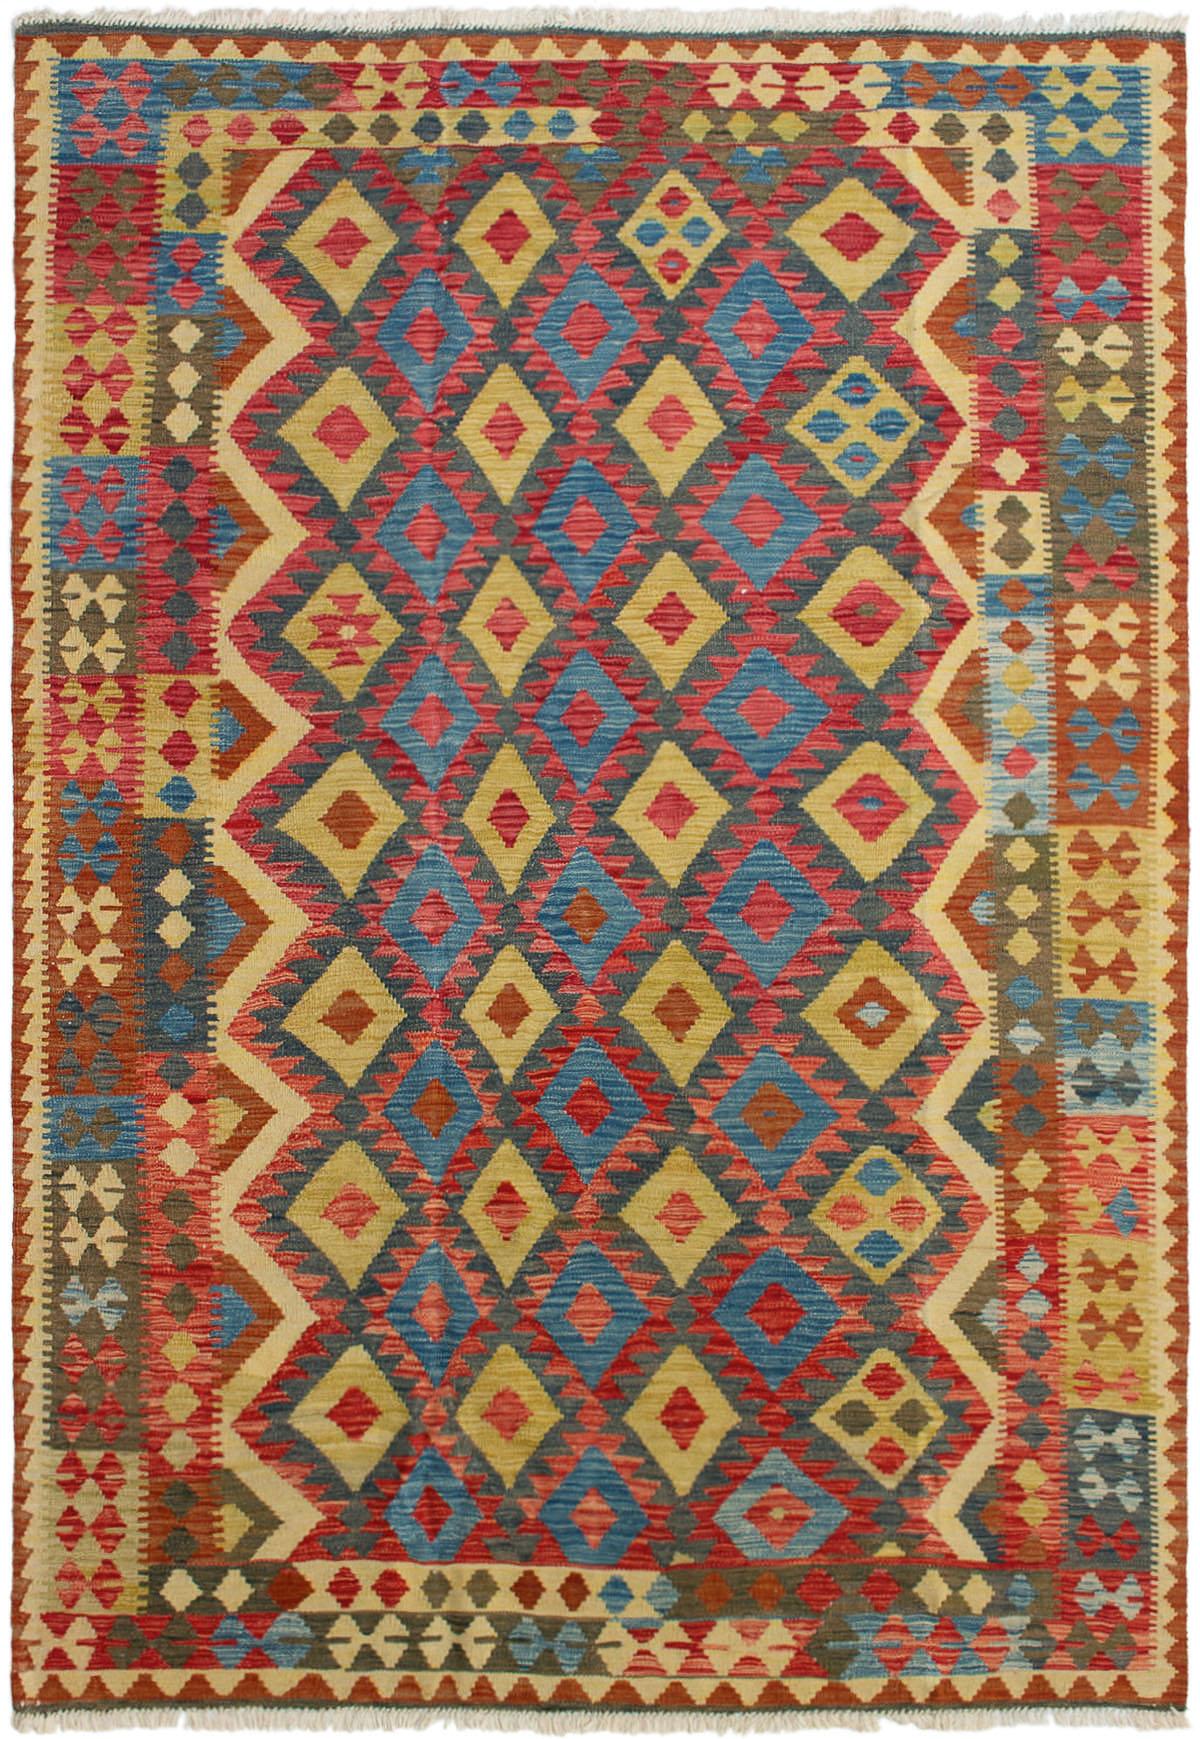 "Hand woven Hereke FW Light Brown, Slate Blue, Tan Wool Kilim 6'6"" x 9'6"" Size: 6'6"" x 9'6"""